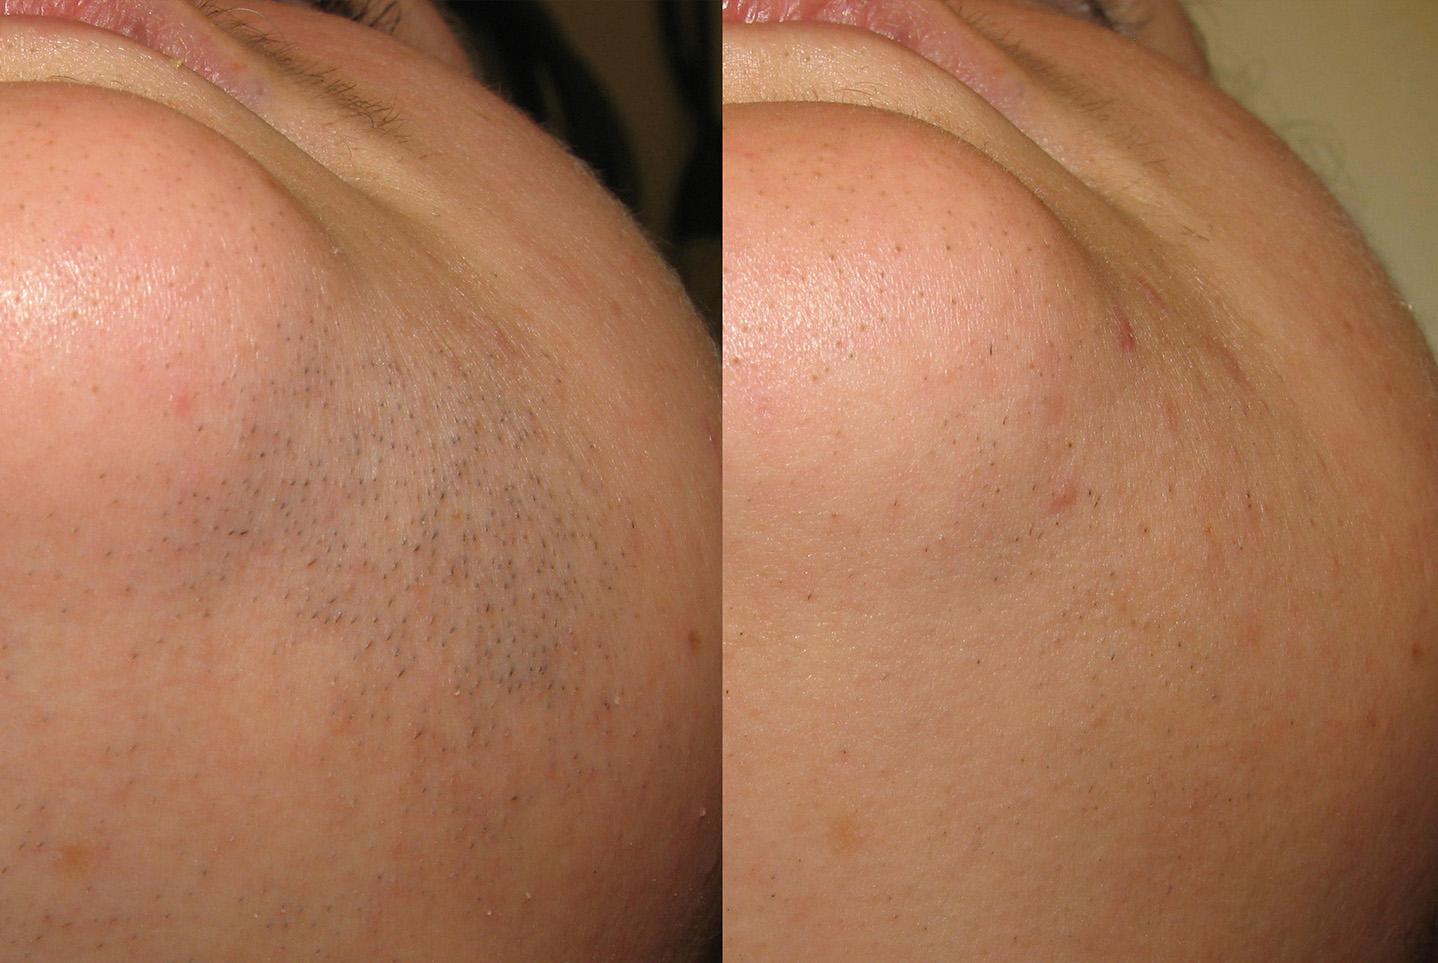 Vectus-Hair-removal-before-and-after-sudbury-ontario-skin-medispa-4